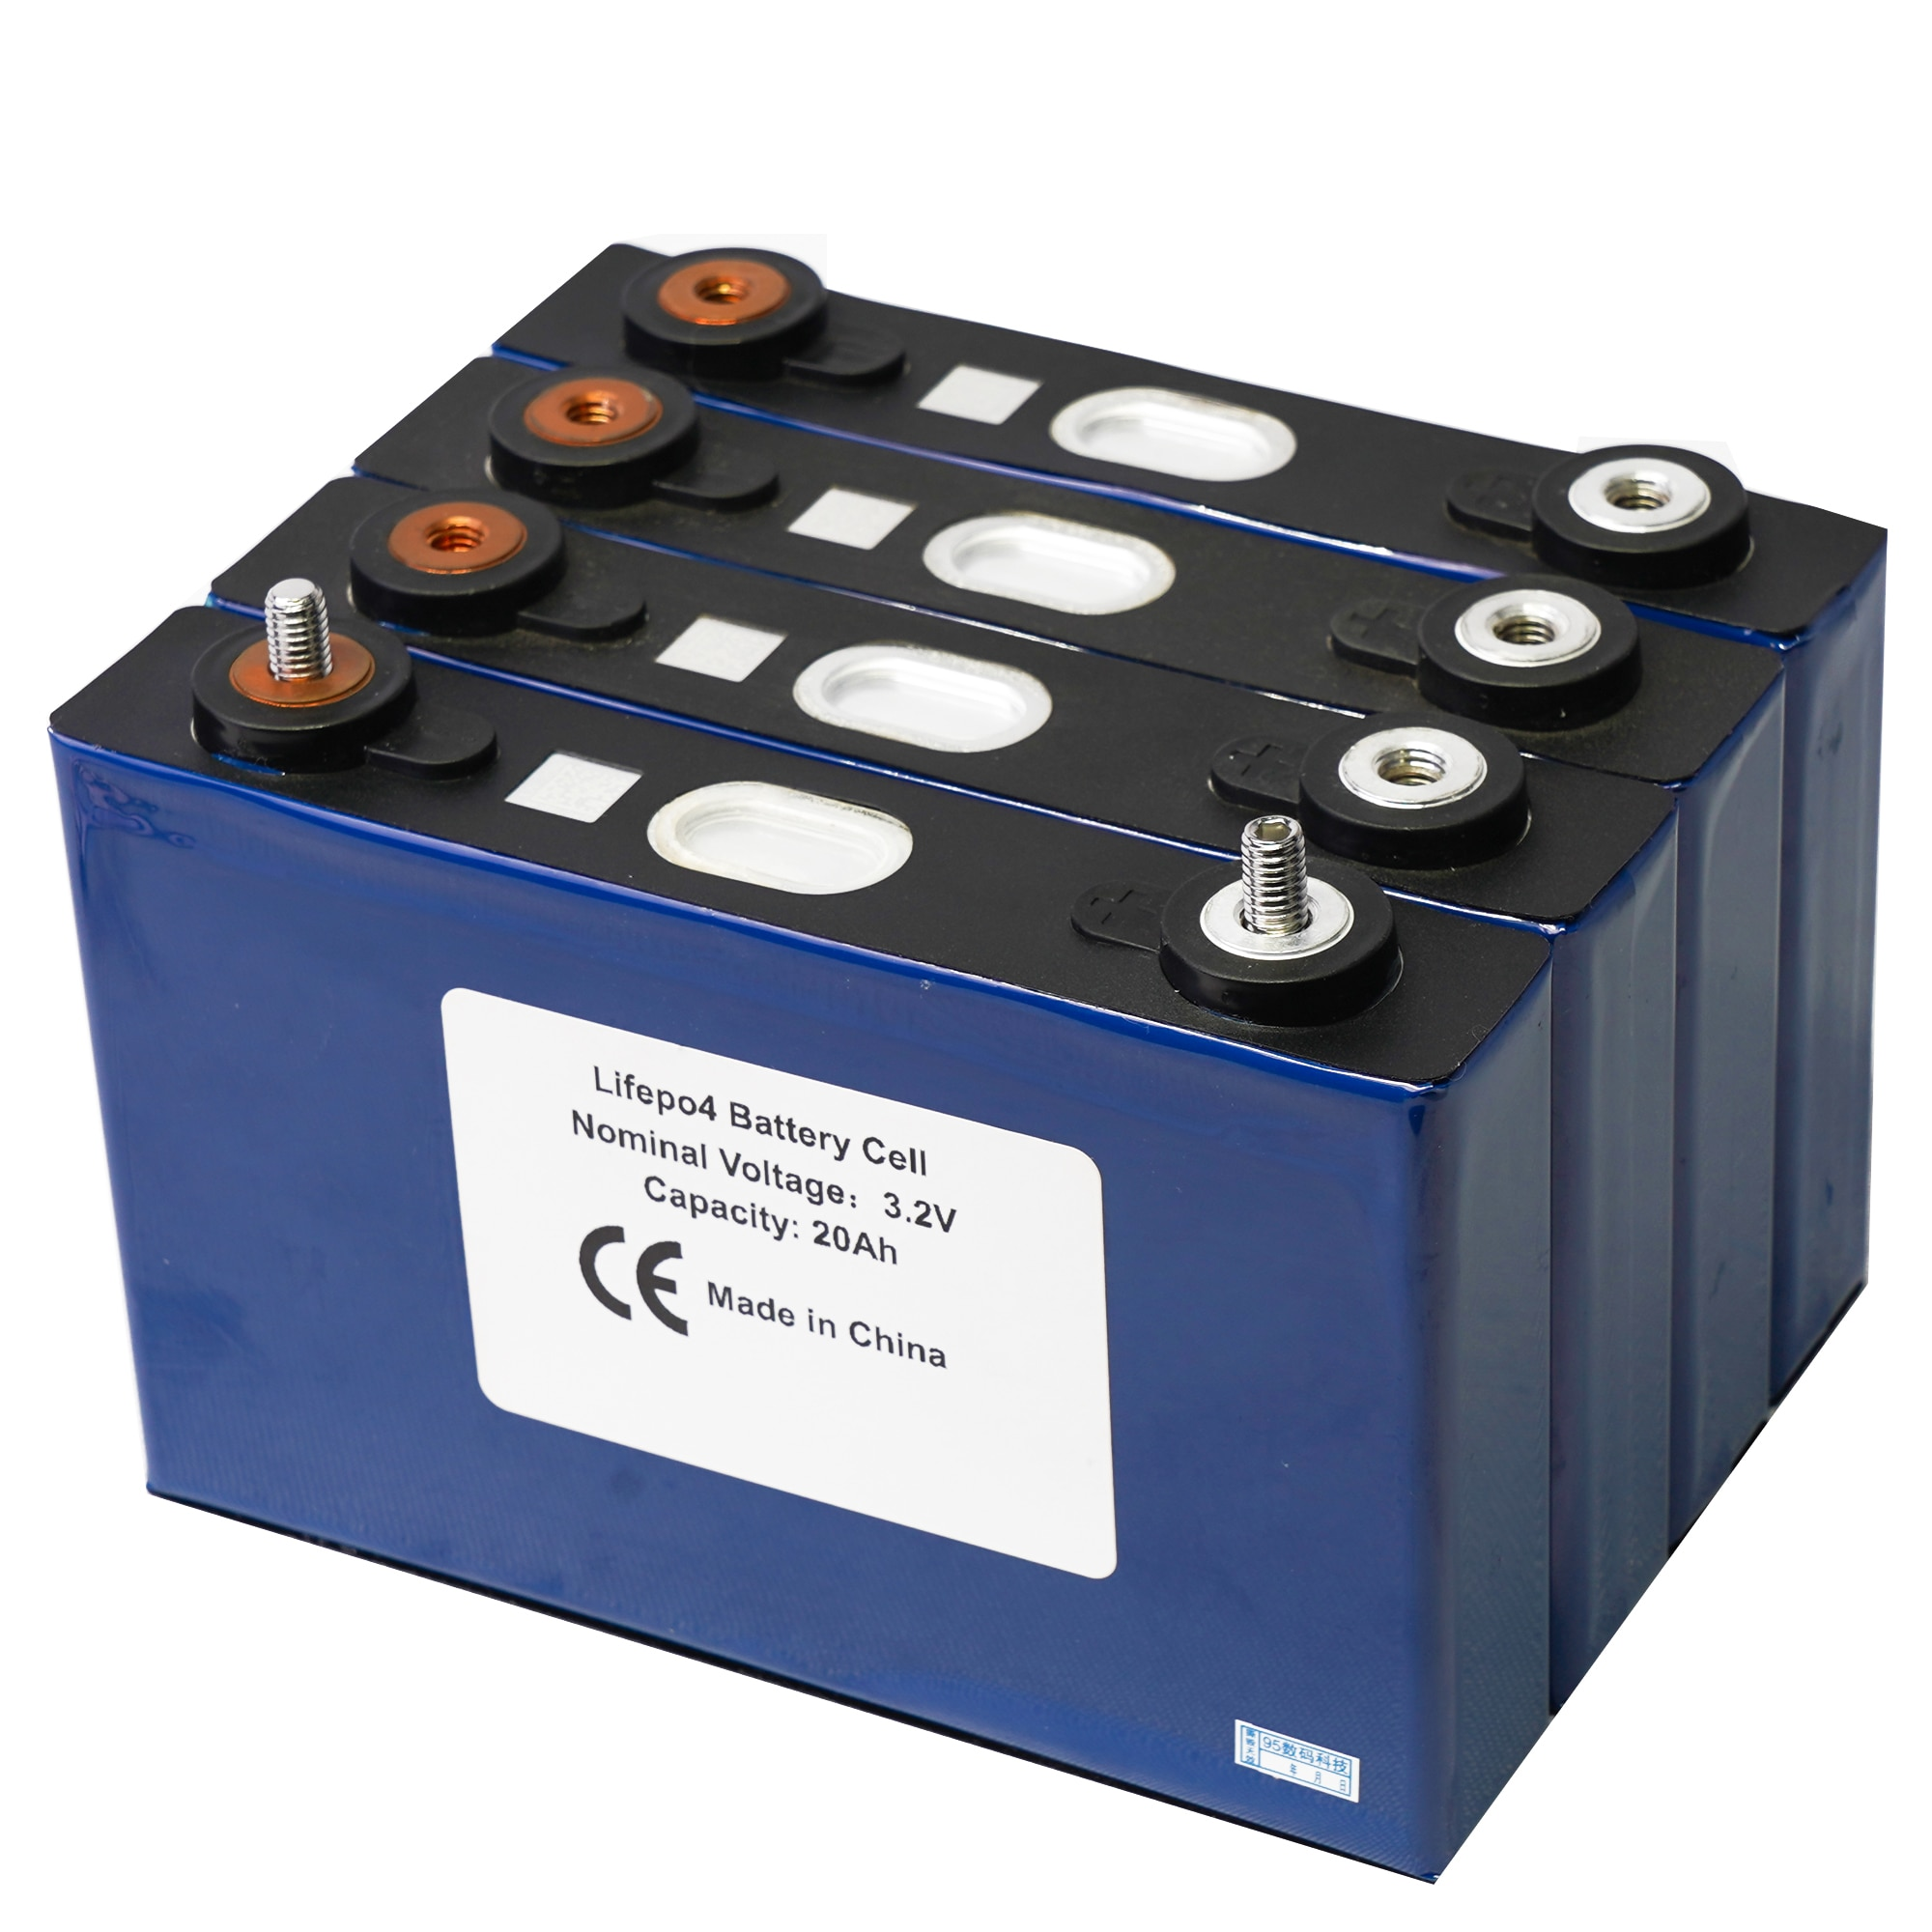 NEUE 20 stücke lifepo4 3,2 v 20ah hohe entladestrom lifepo4 batterie zelle für electrice bike motor batterie pack diy